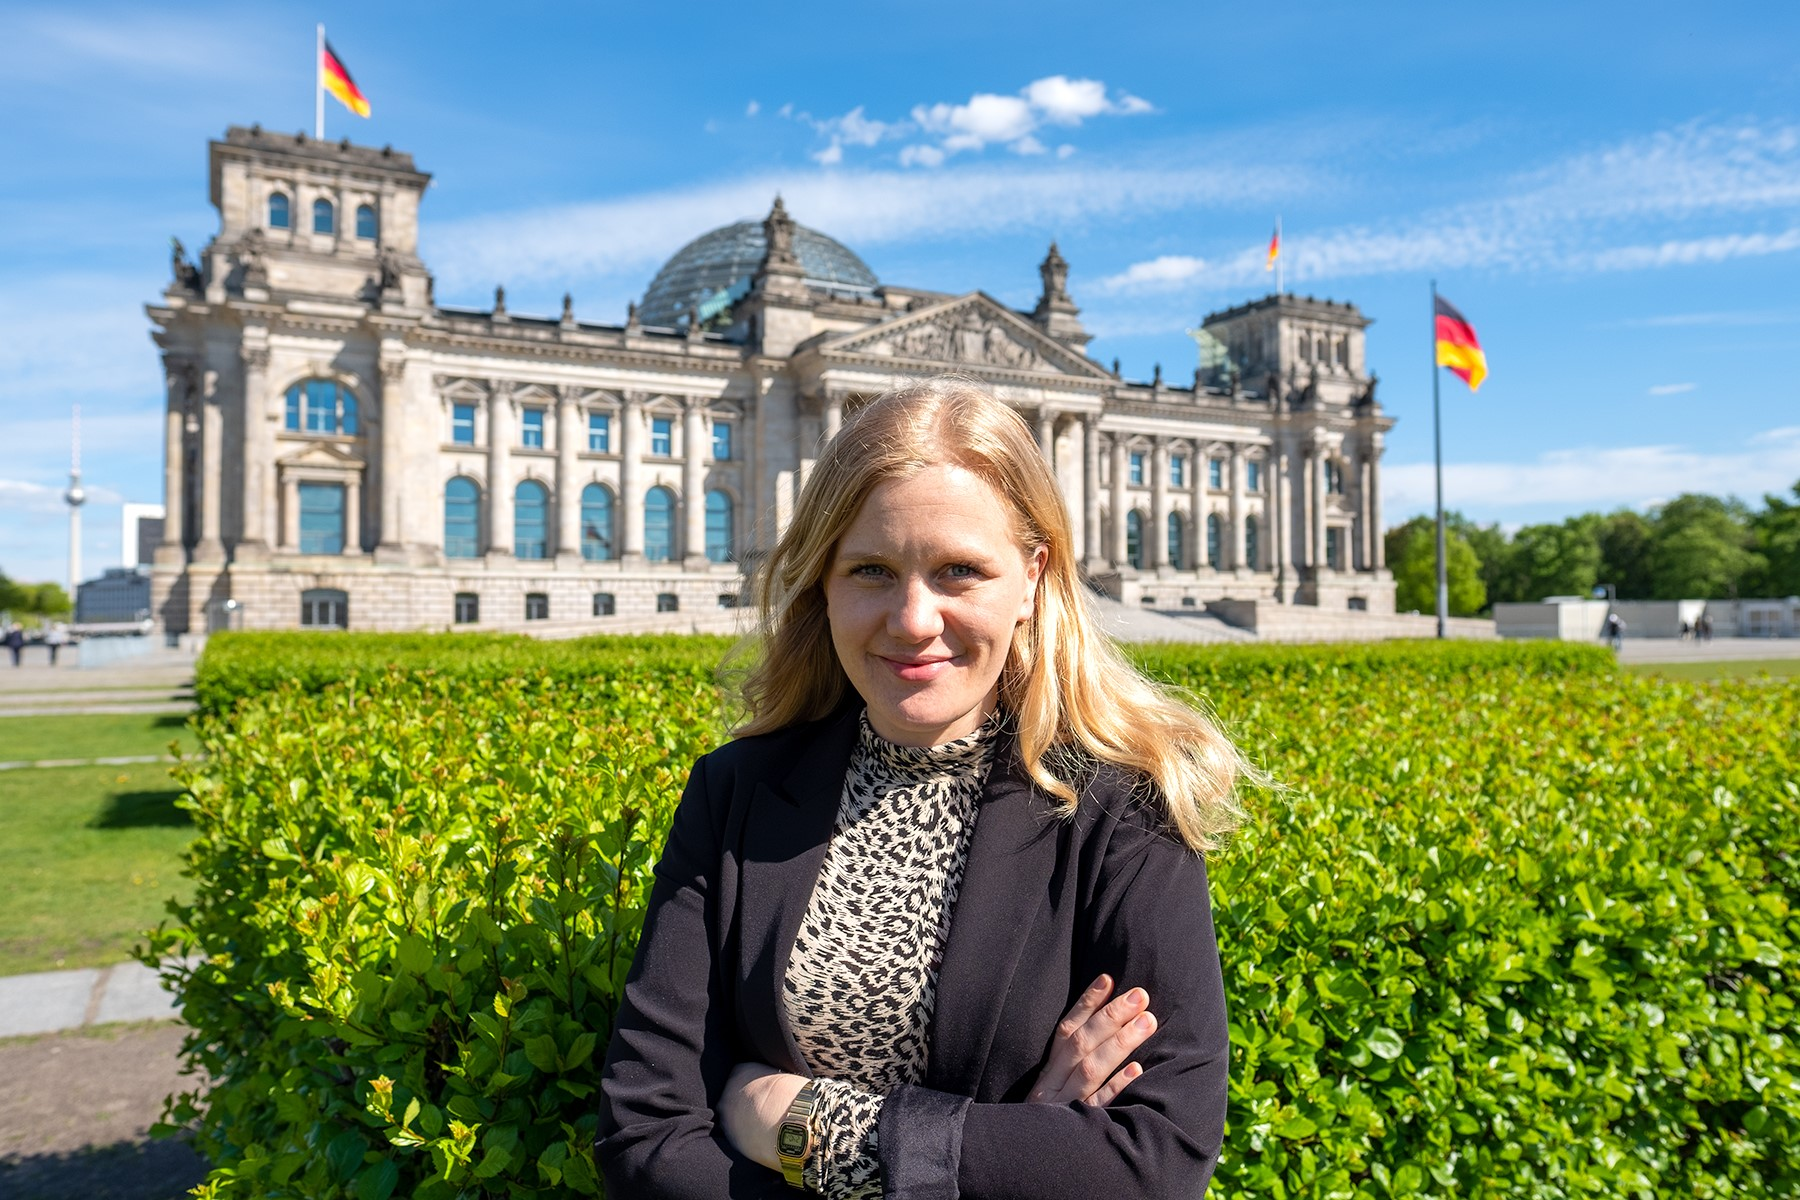 Josephine Ortleb vor dem Bundestag